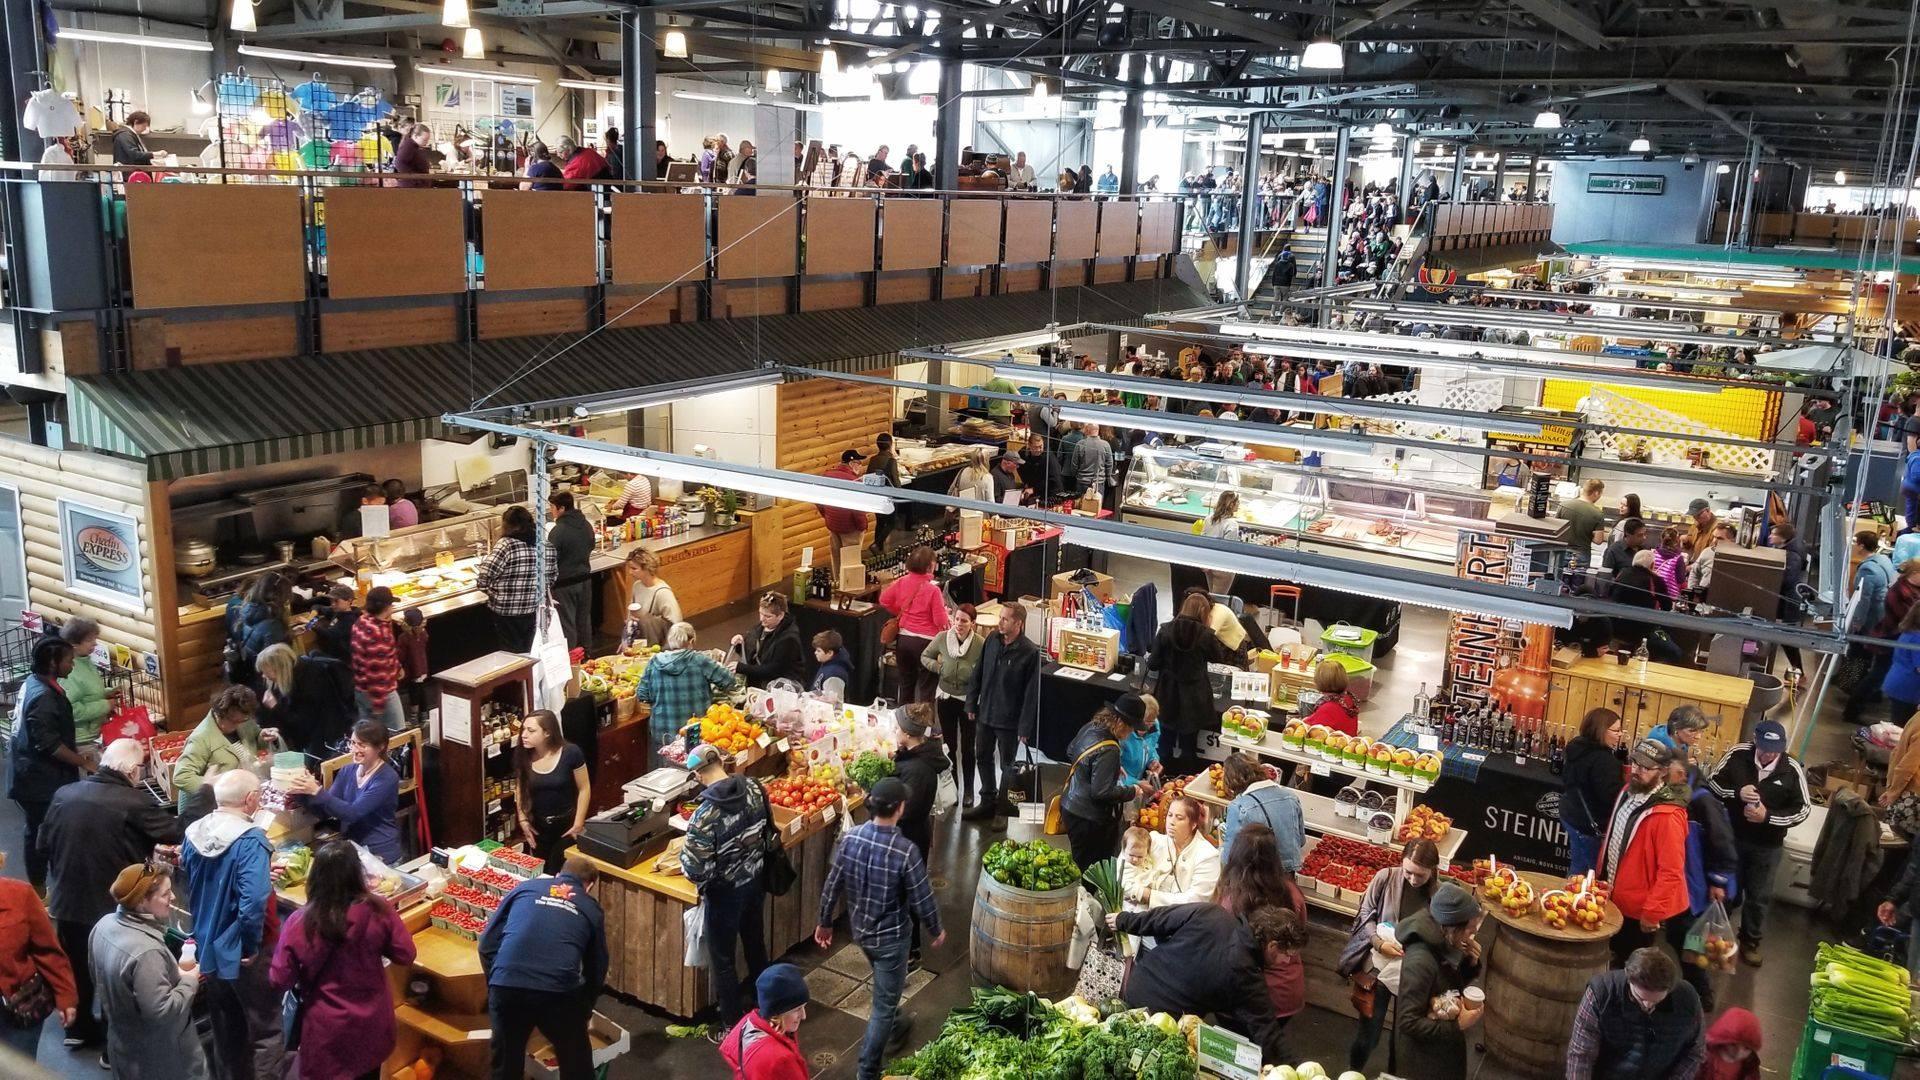 Zero waste options at farmer's markets